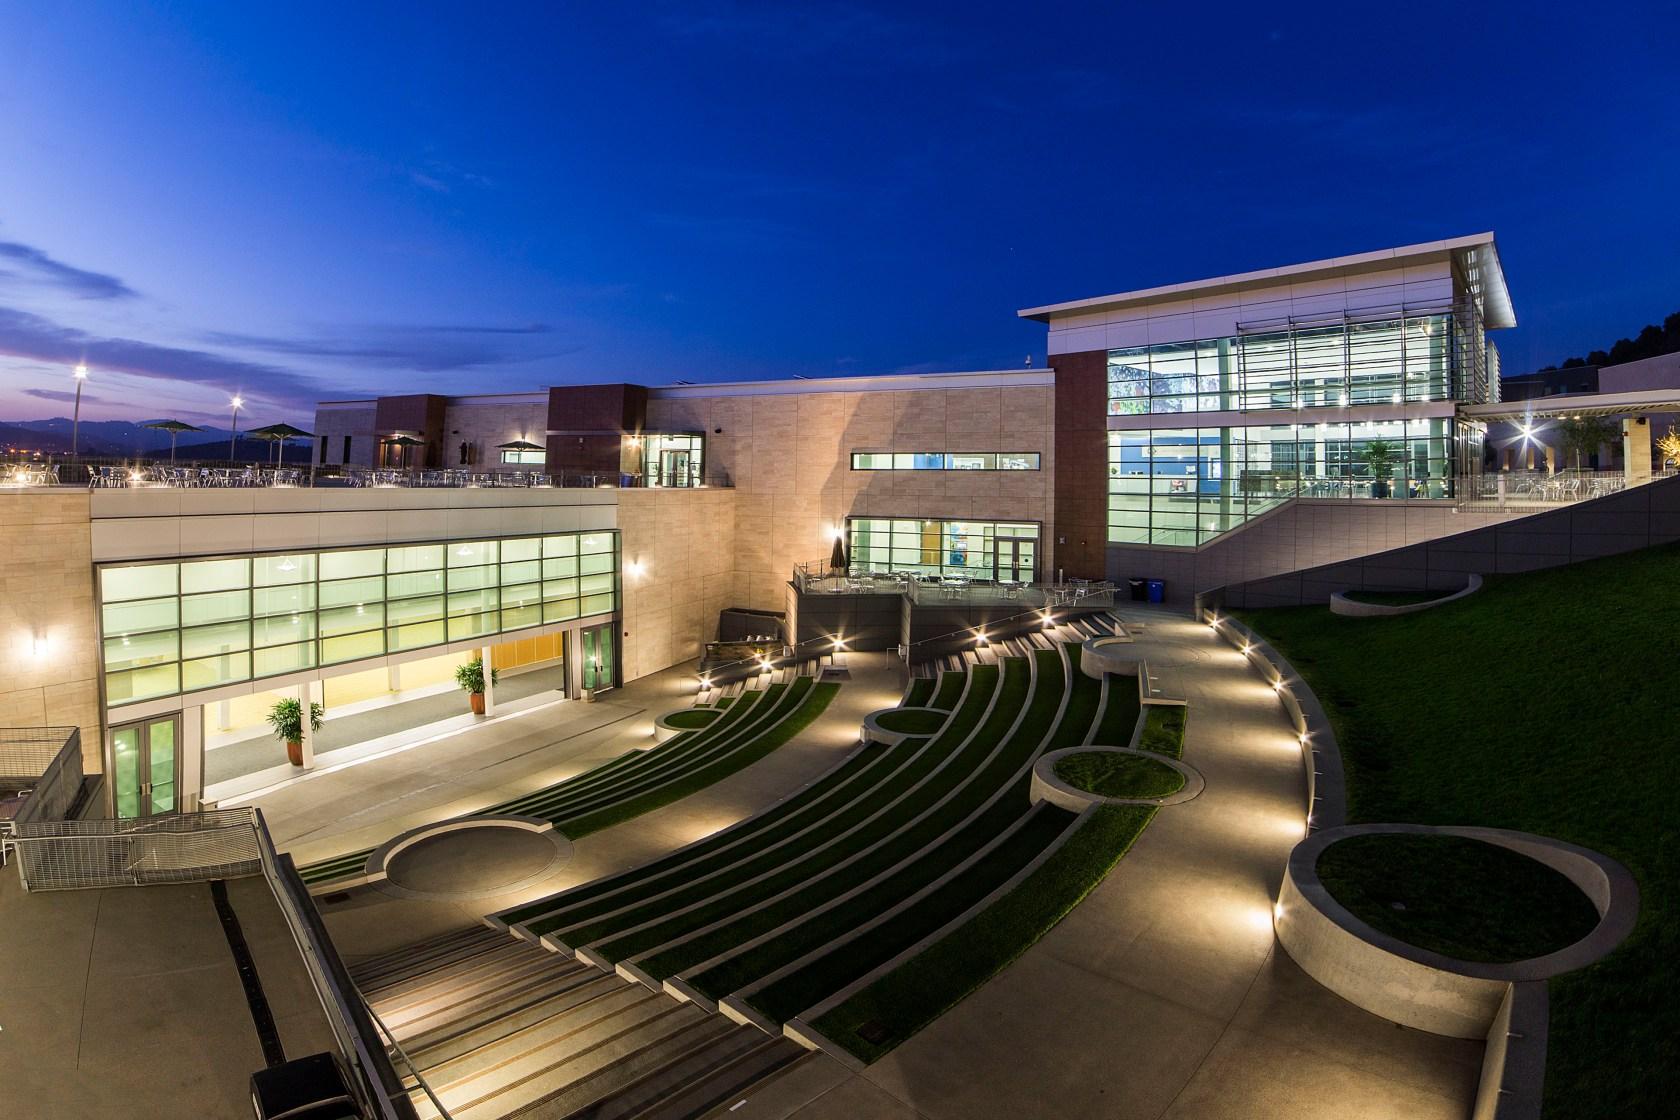 University Student Union California State San